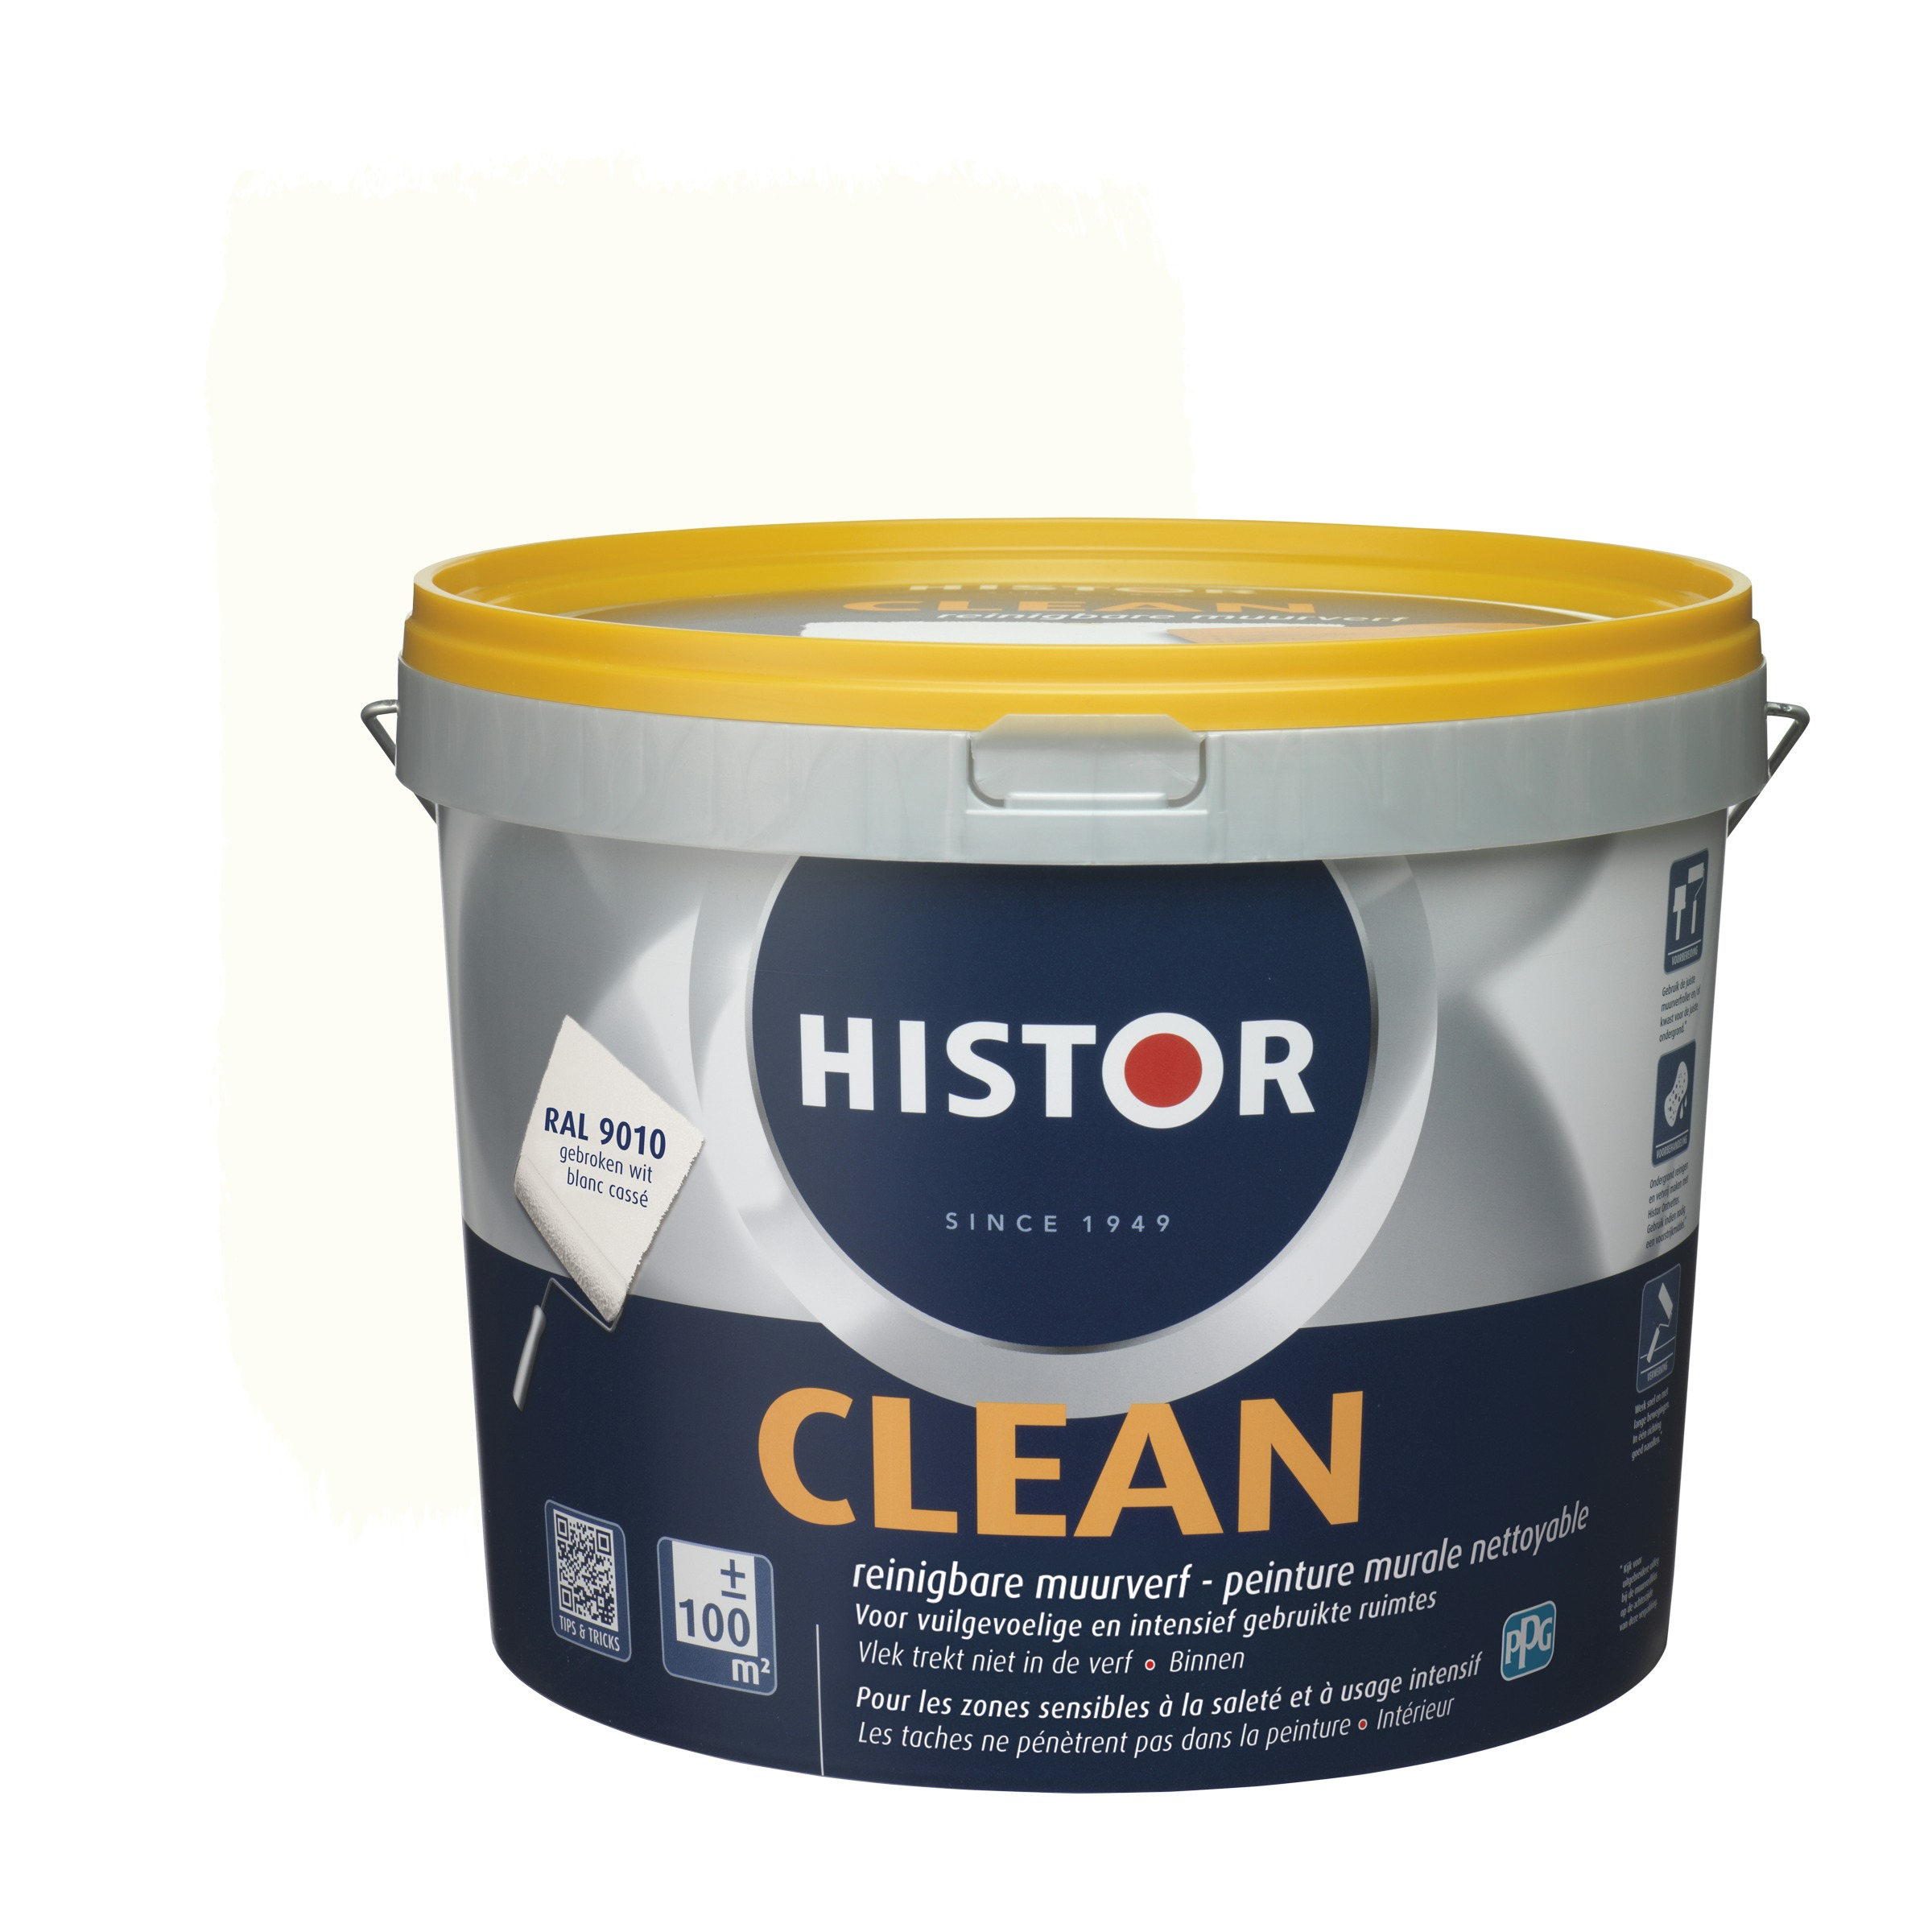 Histor latex Clean RAL 9010 10L